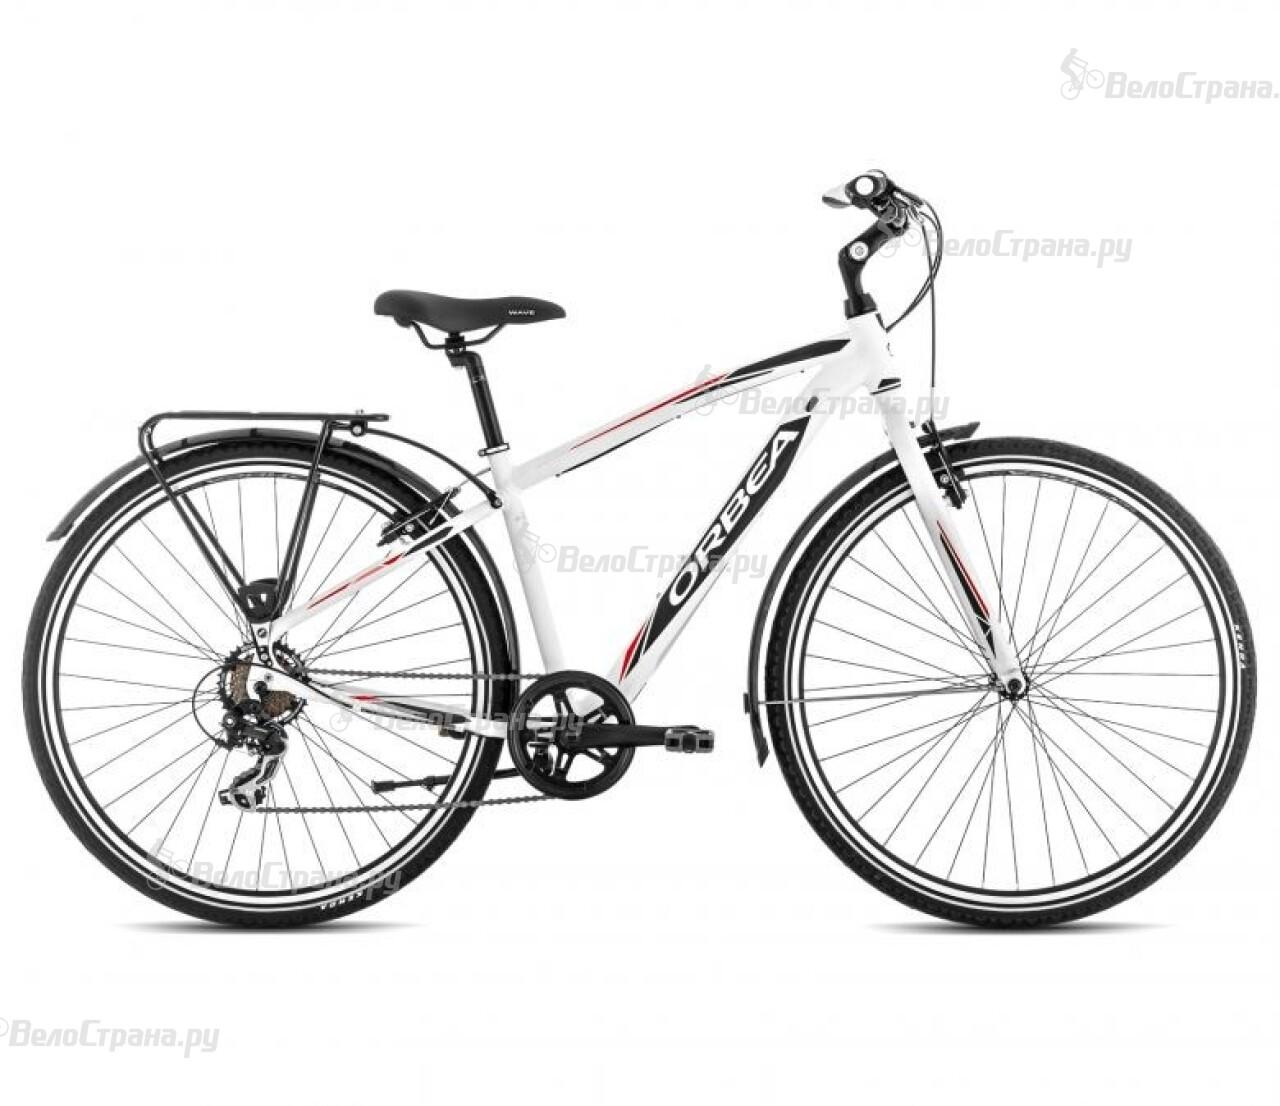 Велосипед Orbea Comfort 28 40 Equipped (2014)